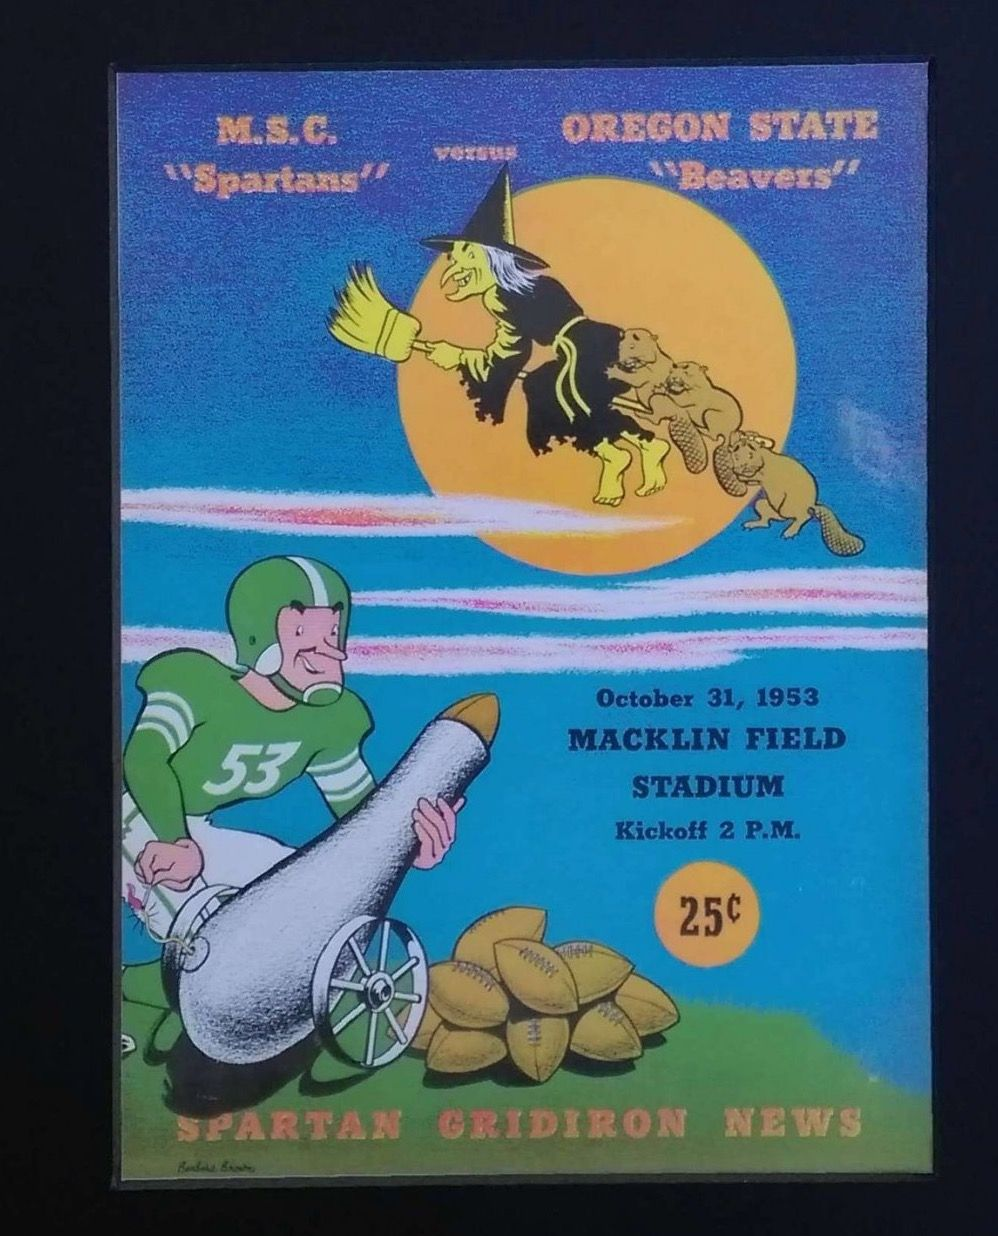 Oregon state beavers vs michigan state football program